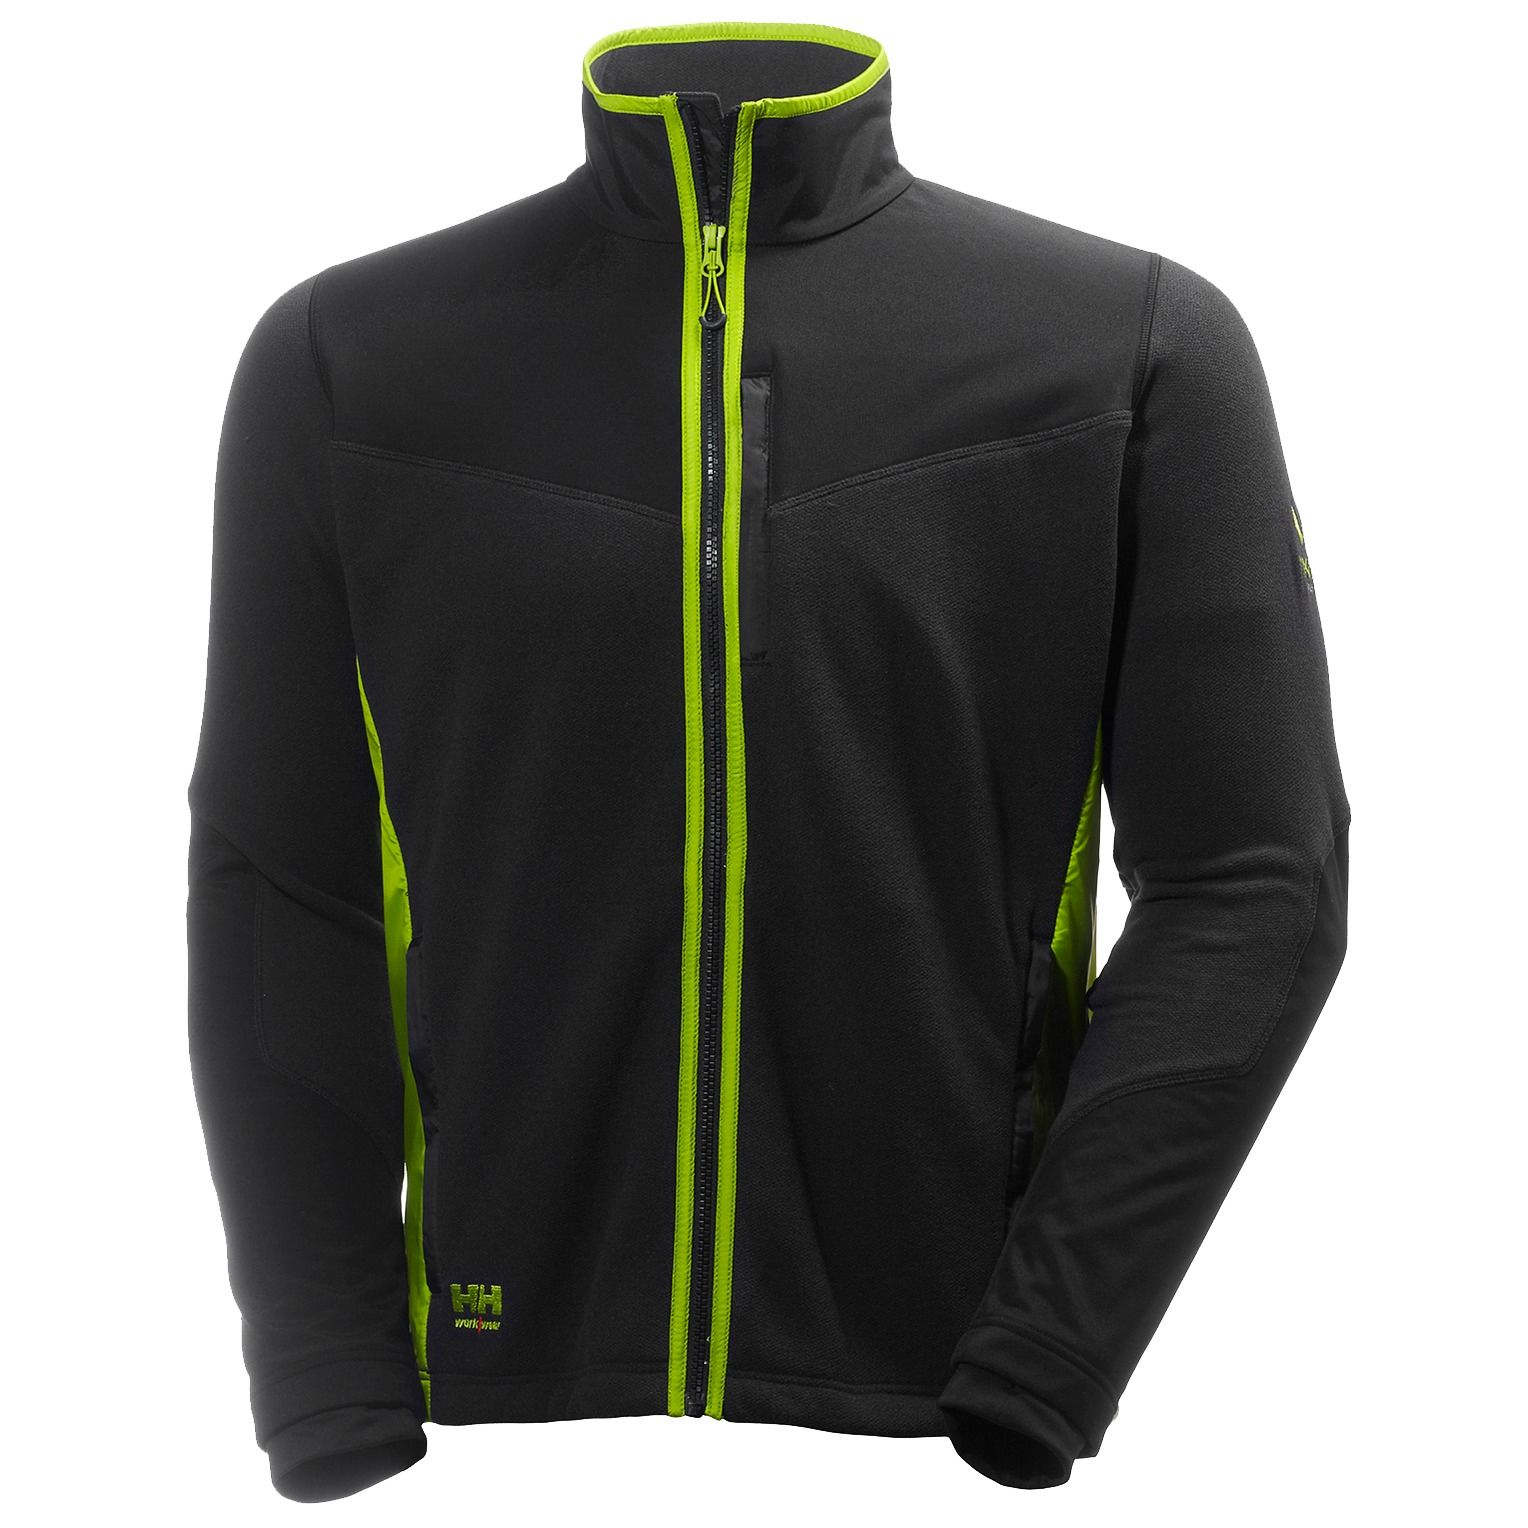 0b01ce17 magni fleece jacket/arbeidstøy/arbeidsjakke/helly hansen/haugseng.no